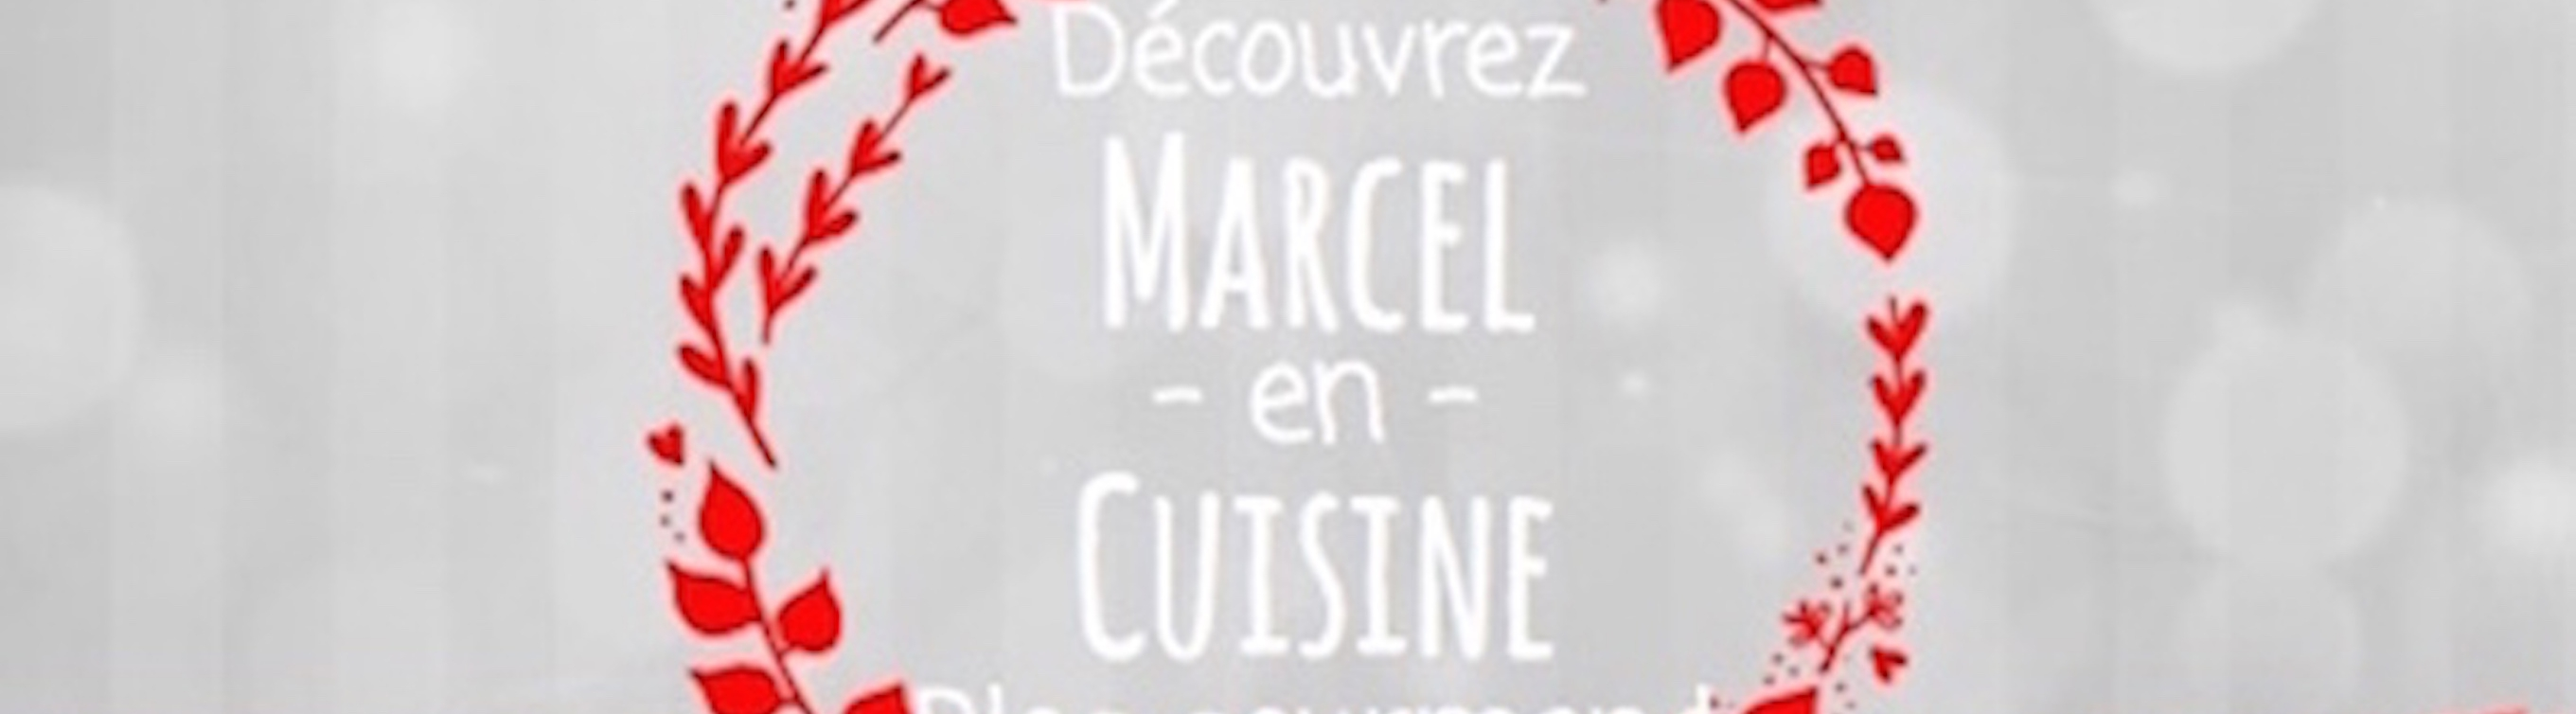 Marcel en Cuisine